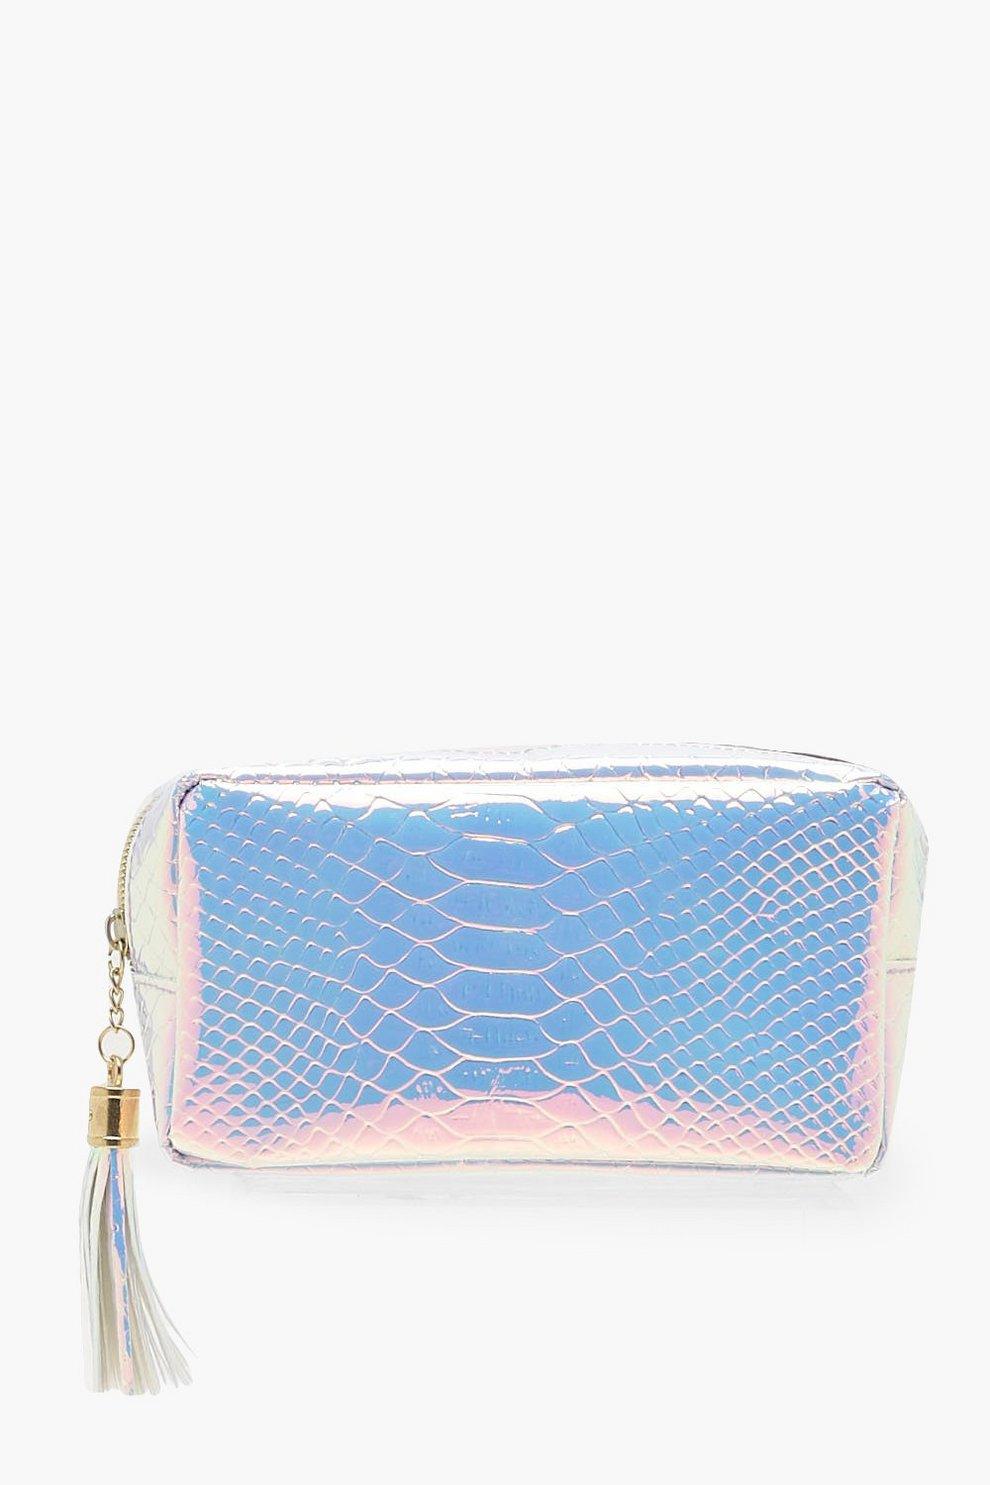 b611be732416 Holographic Mermaid Small Makeup Bag